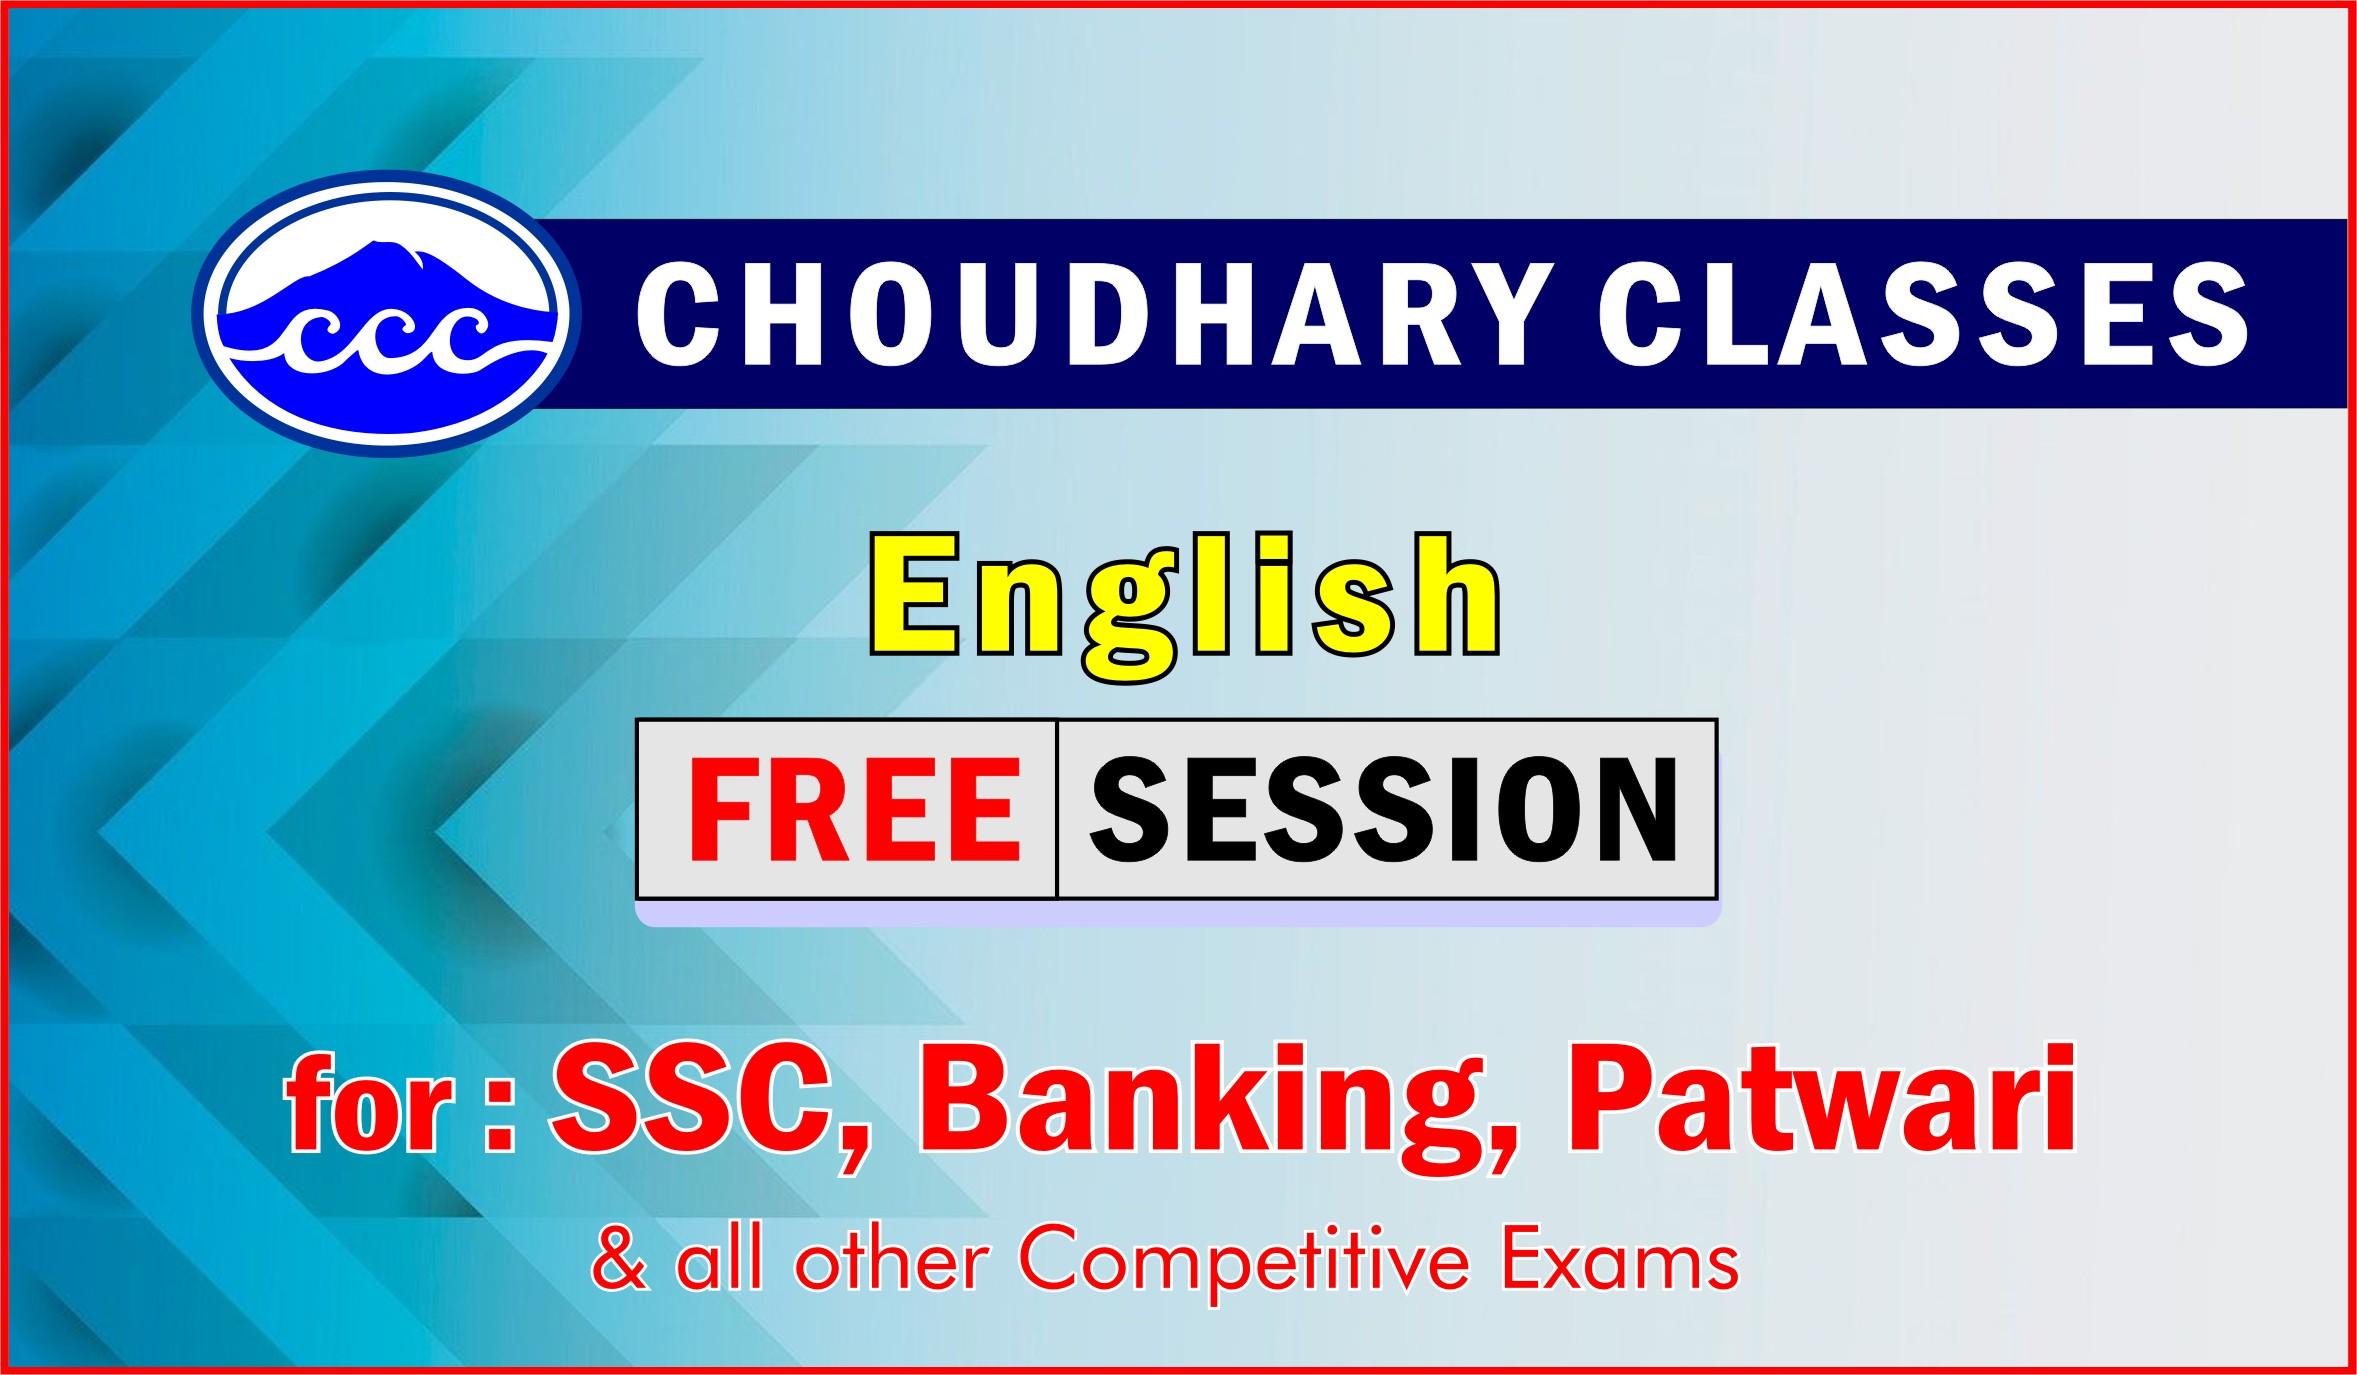 English Practice Session - 6